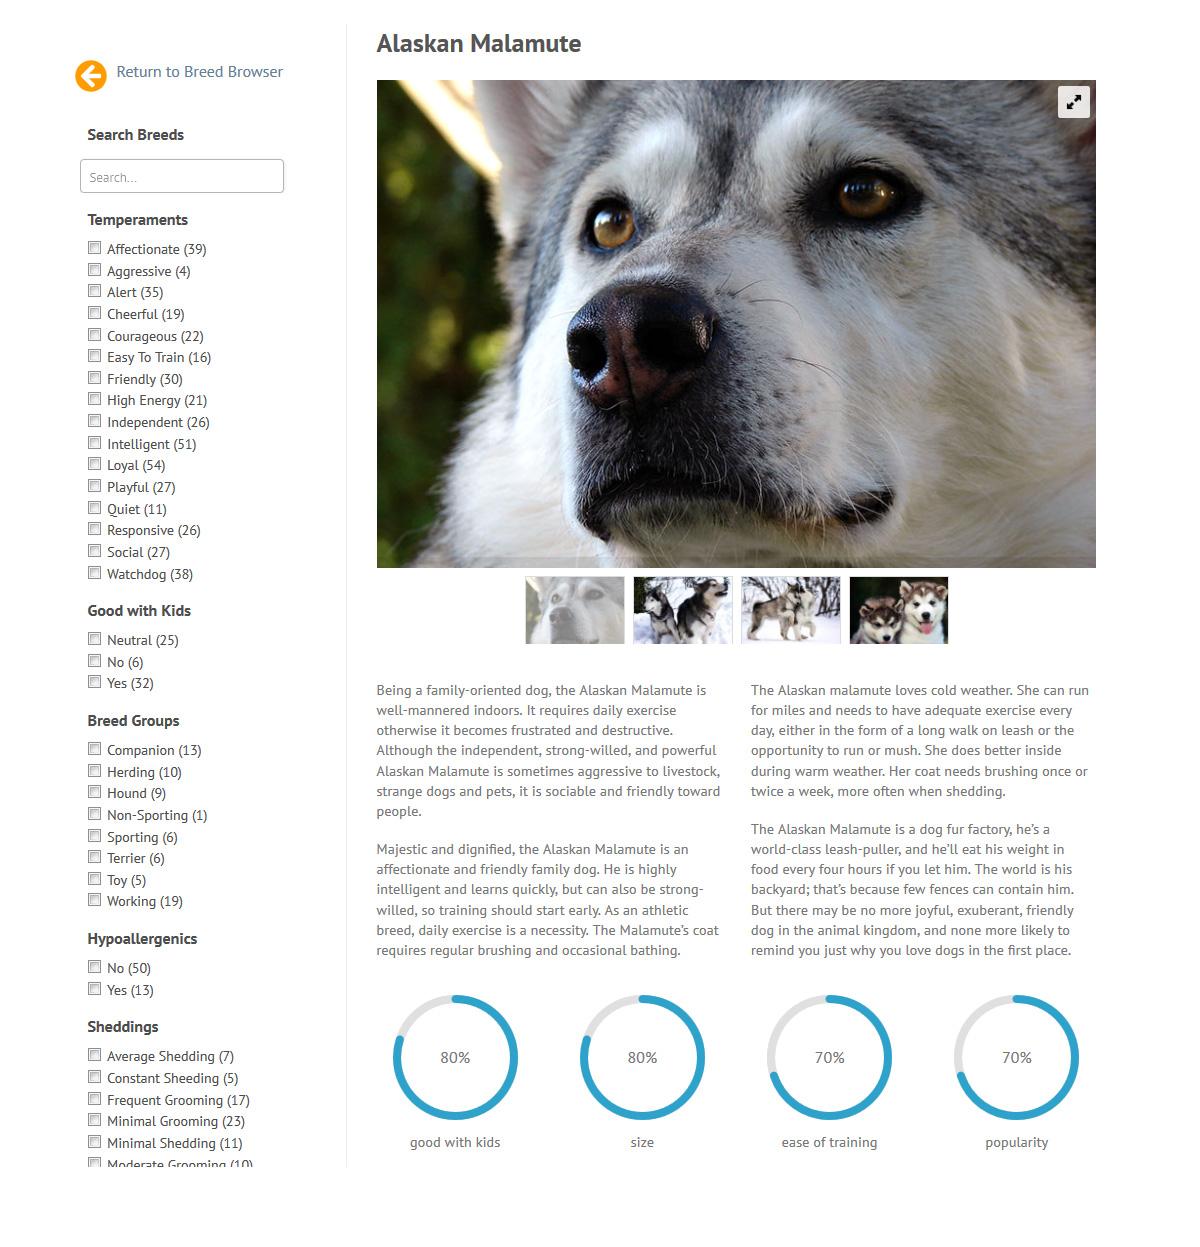 puppies_plus_dogs_alaskan